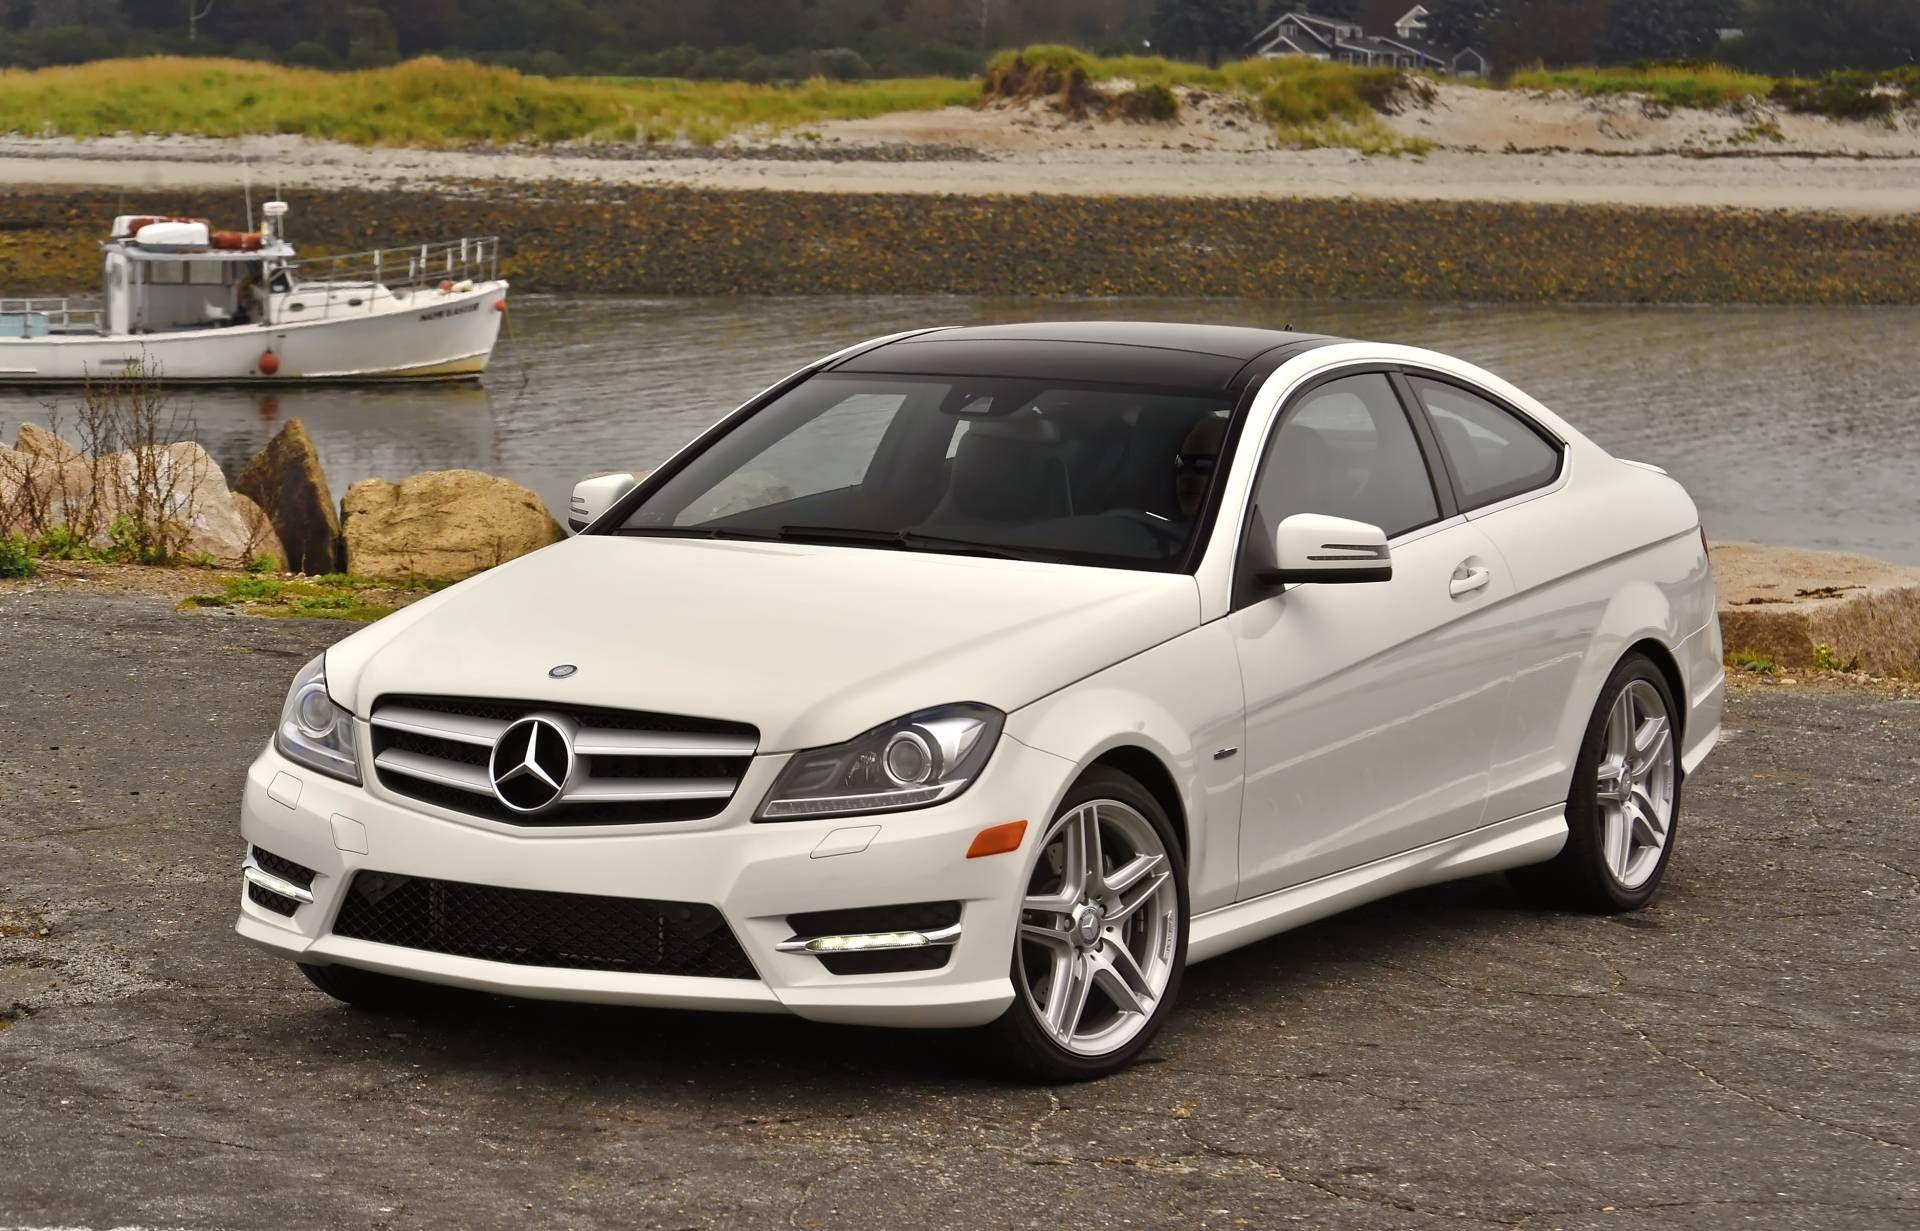 13 best CClass images on Pinterest  C class Mercedes benz and